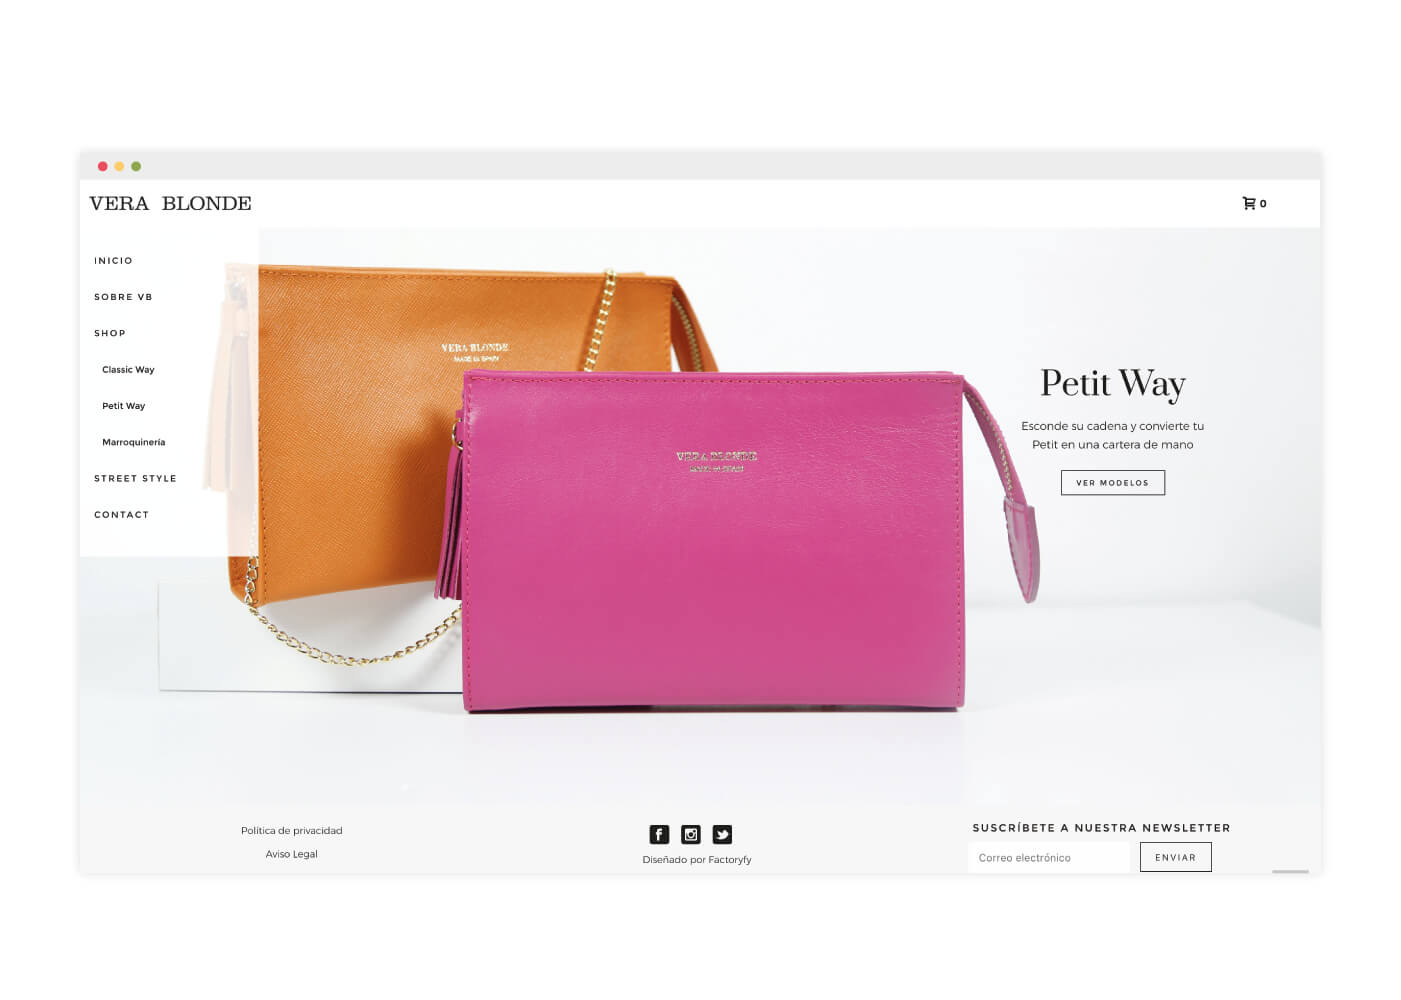 diseno-programacion-tienda-online-bolsos-vera-blonde-3